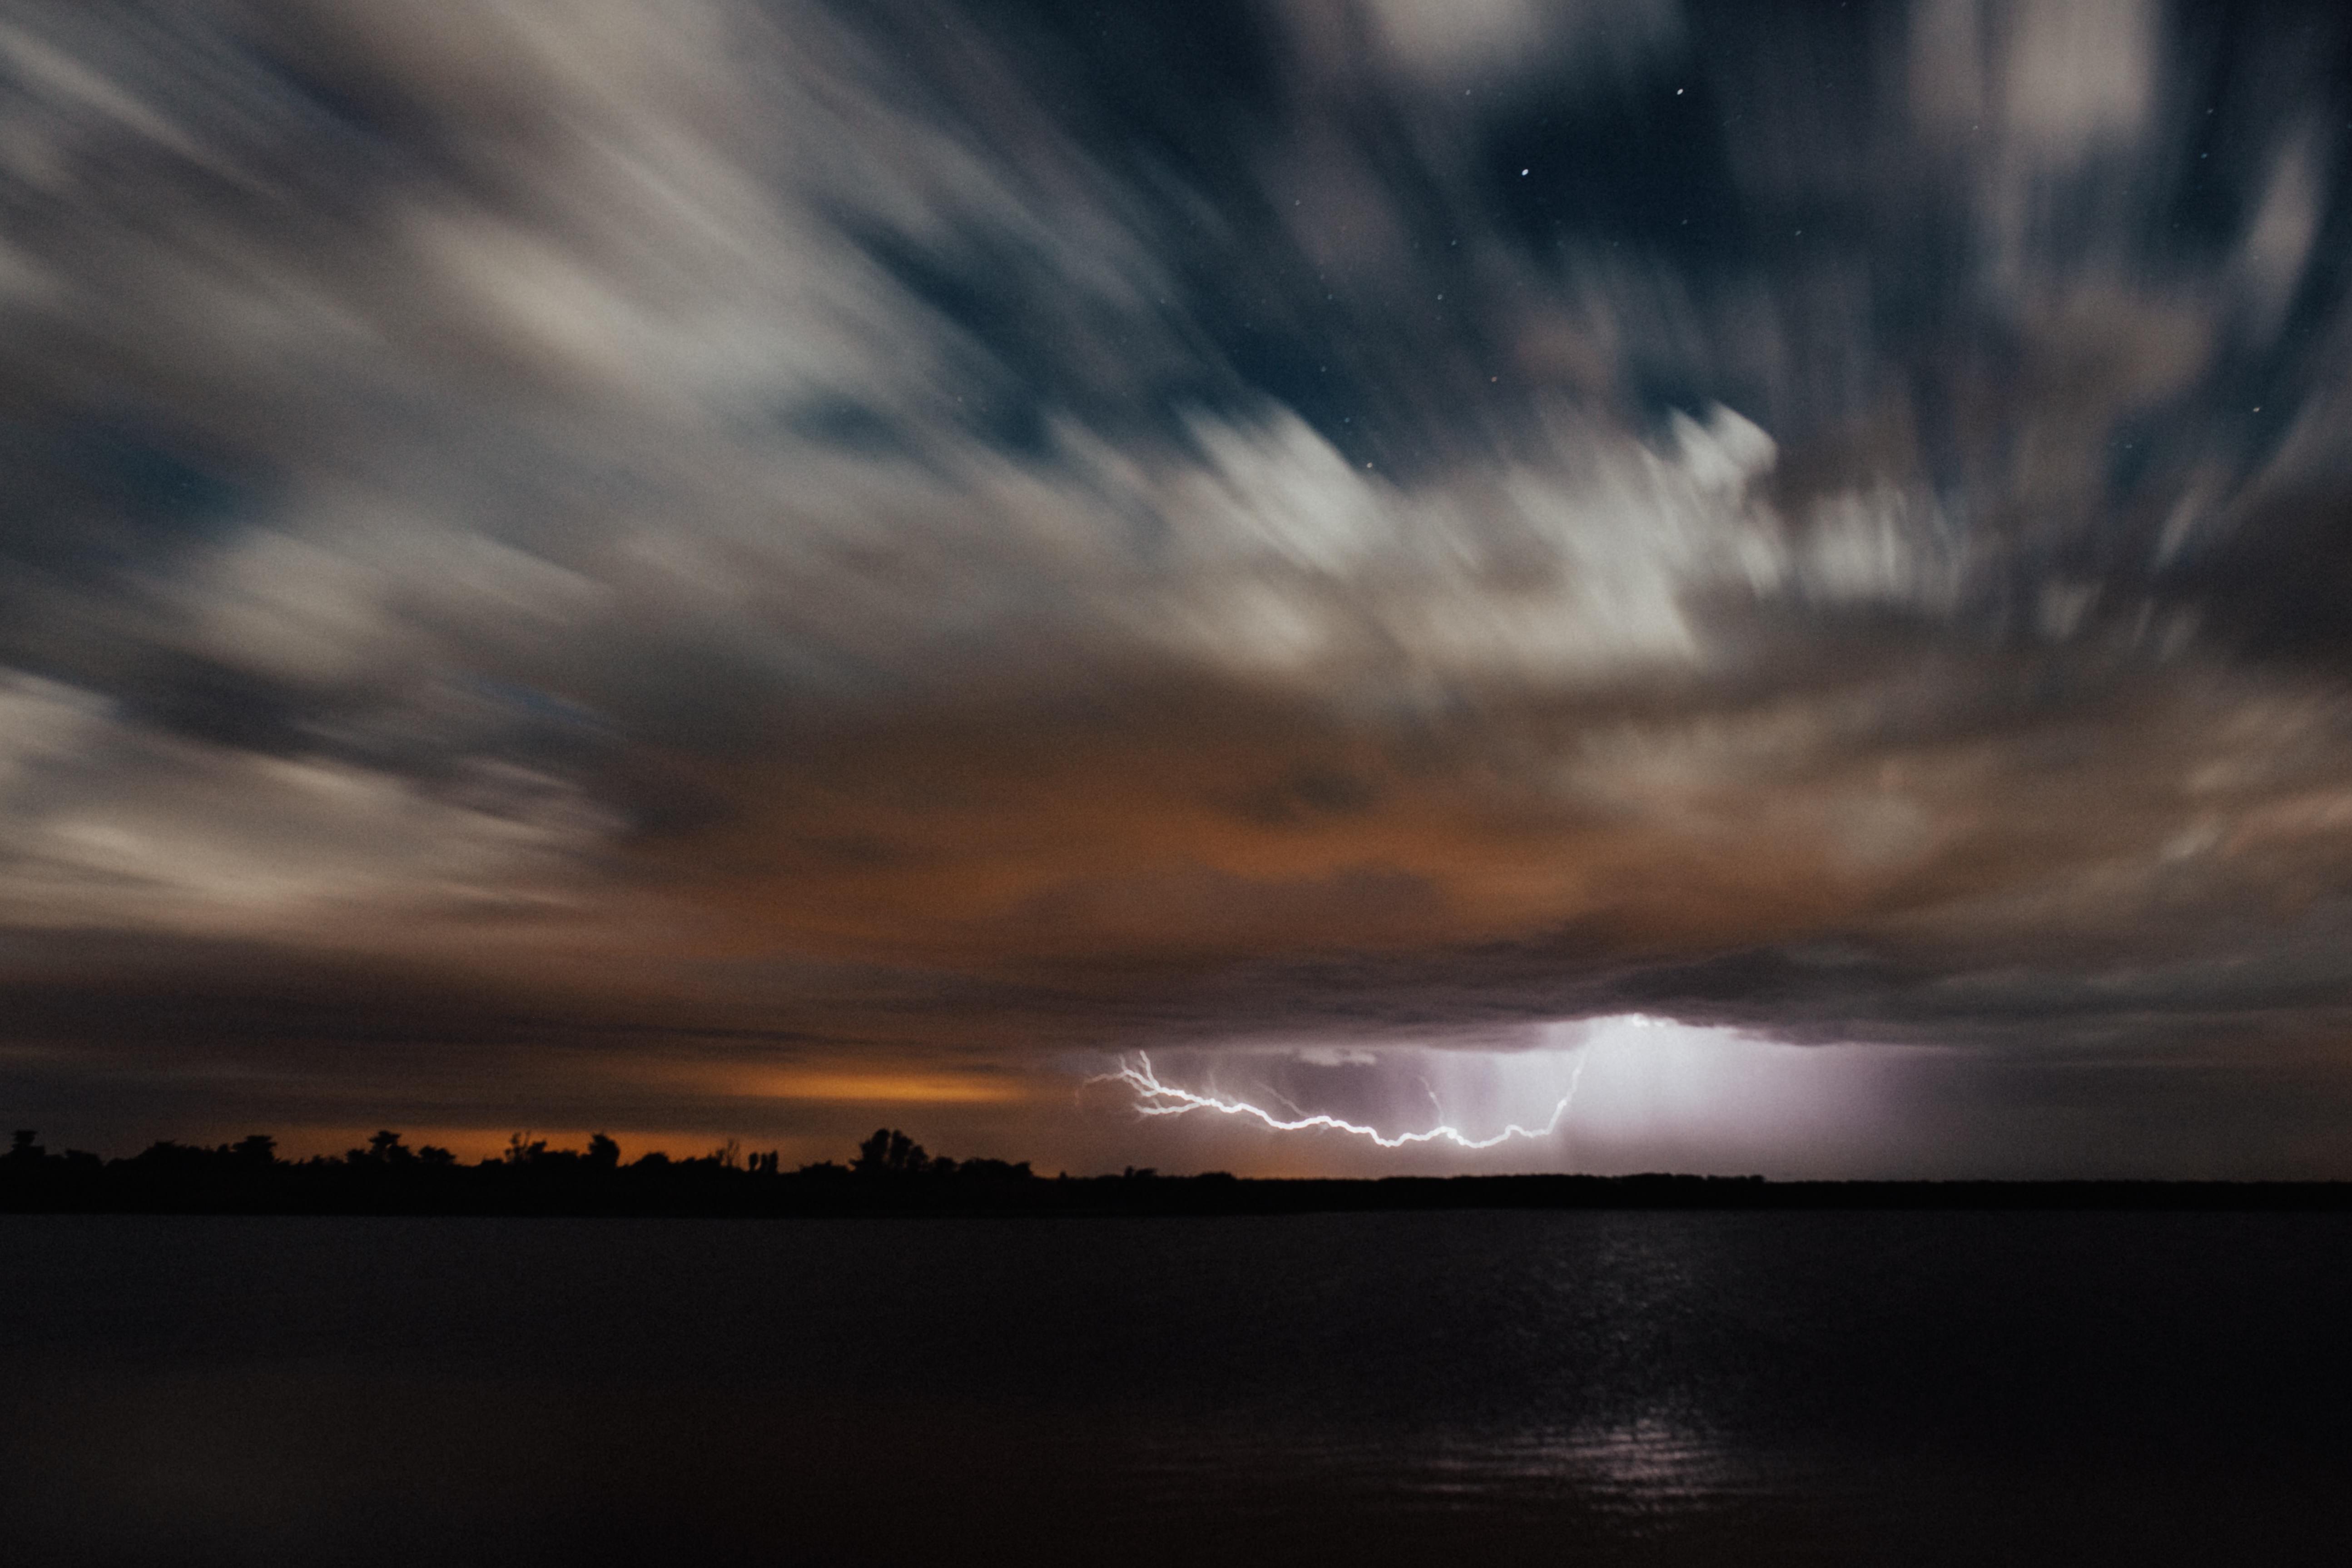 time lapsed photo of lightning during nighttime